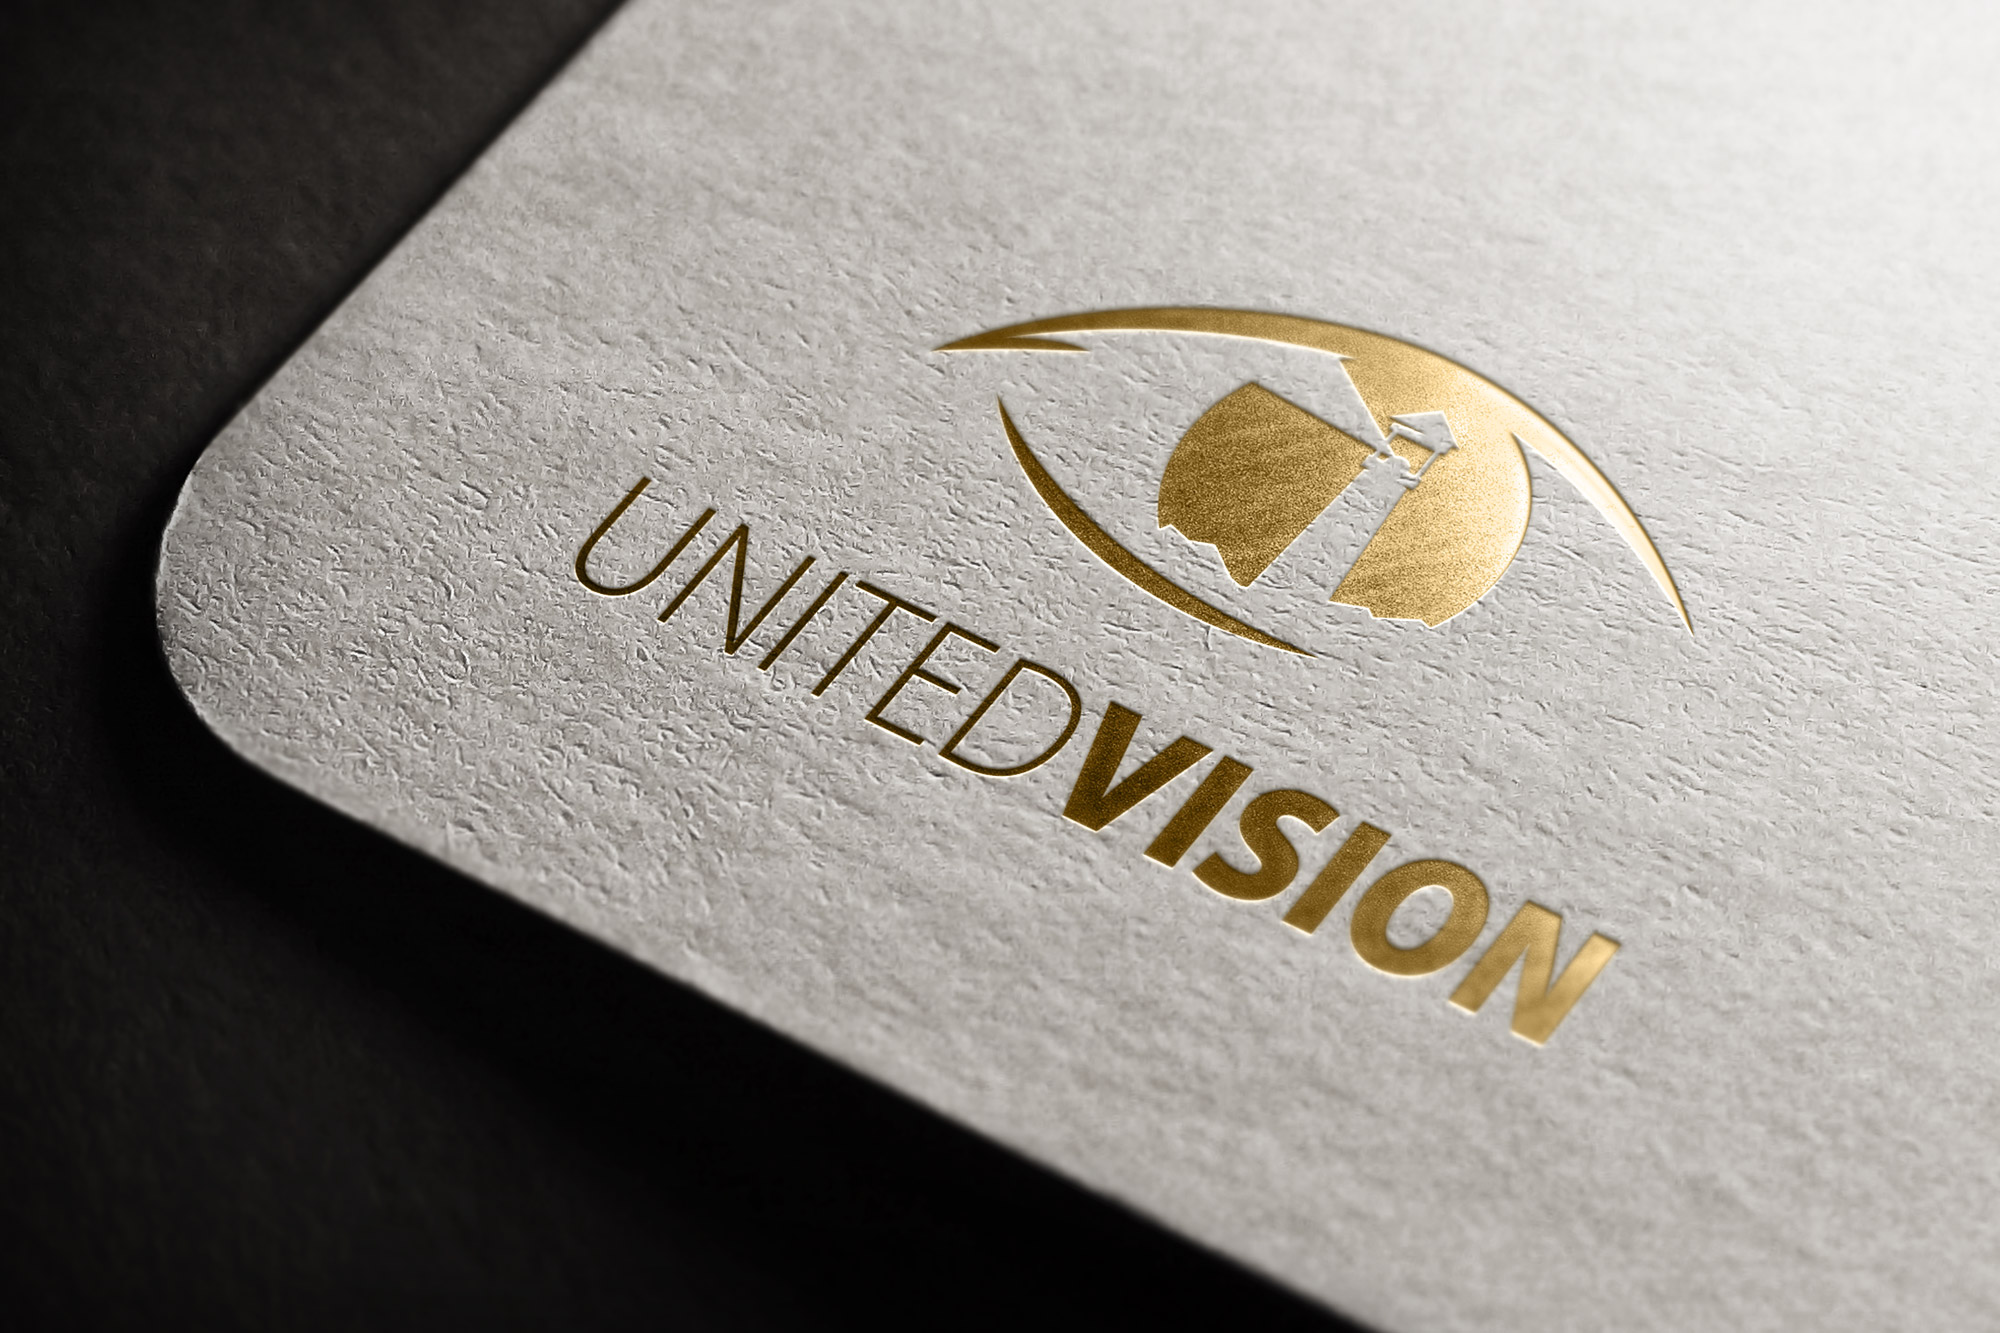 projekt logo united vision, projektowanie logo